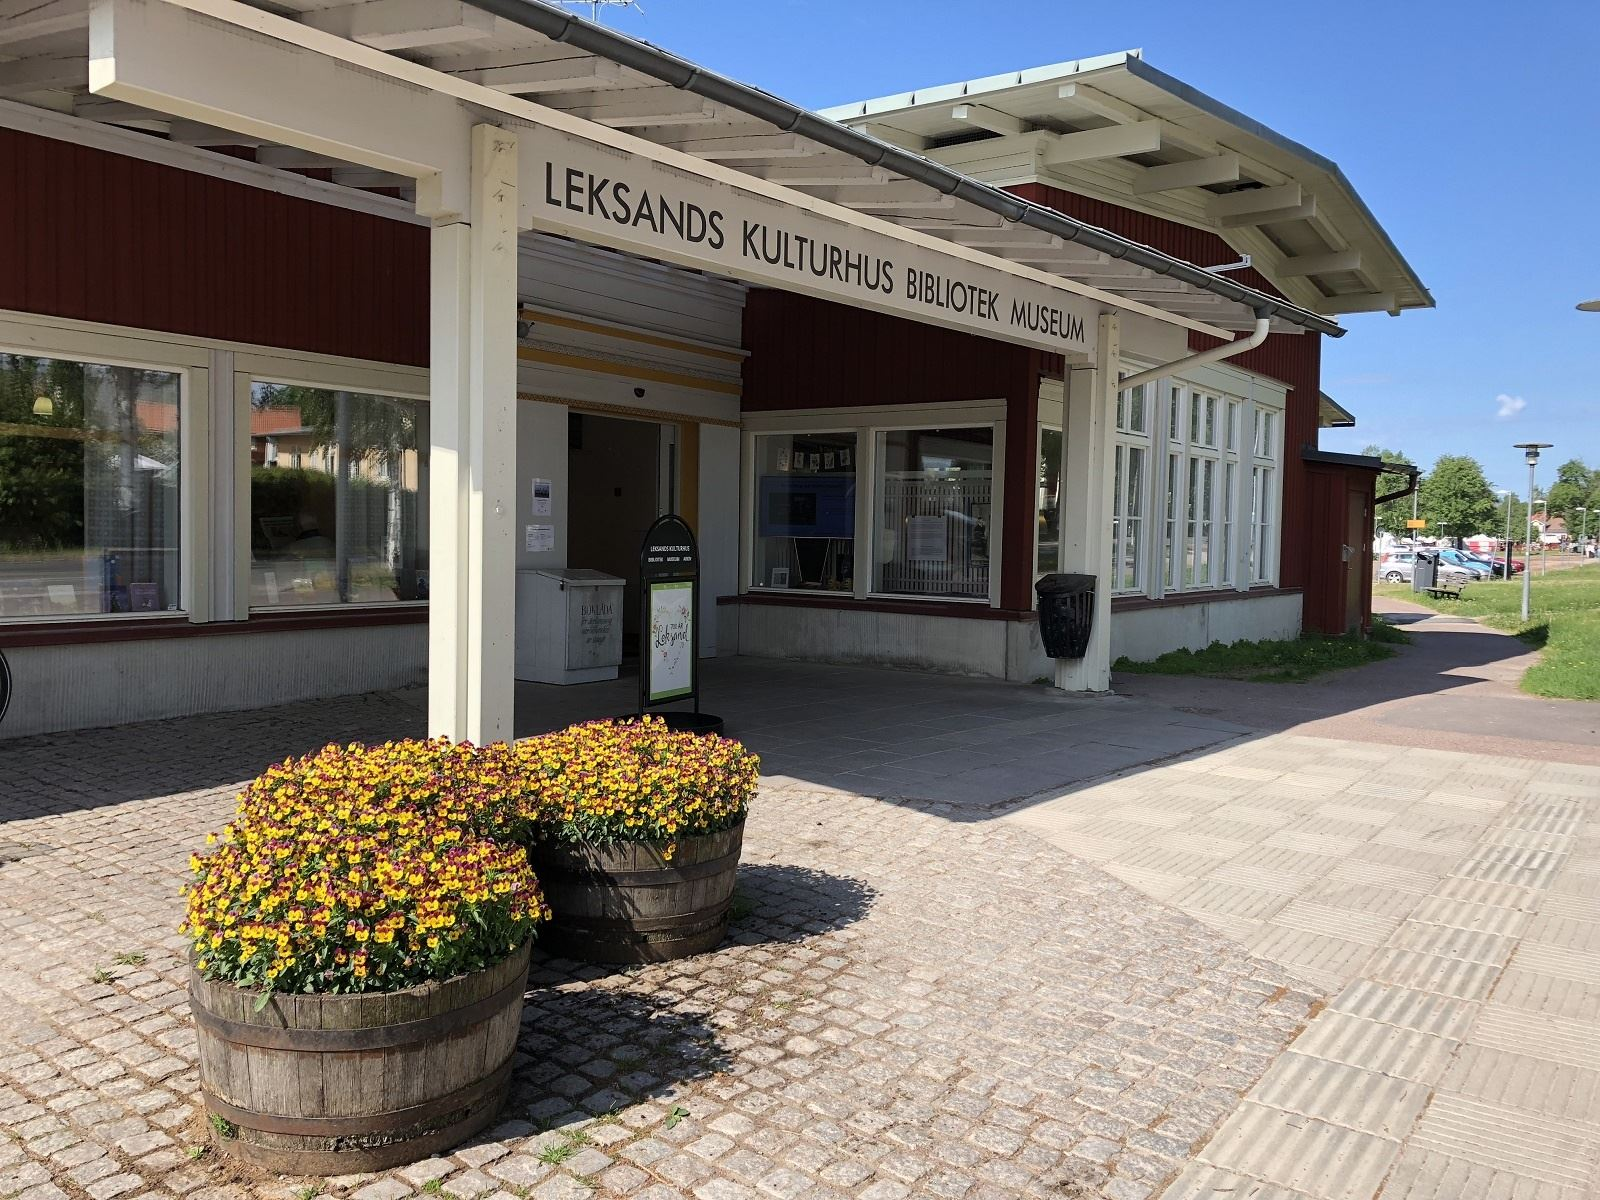 Leksands kulturhus